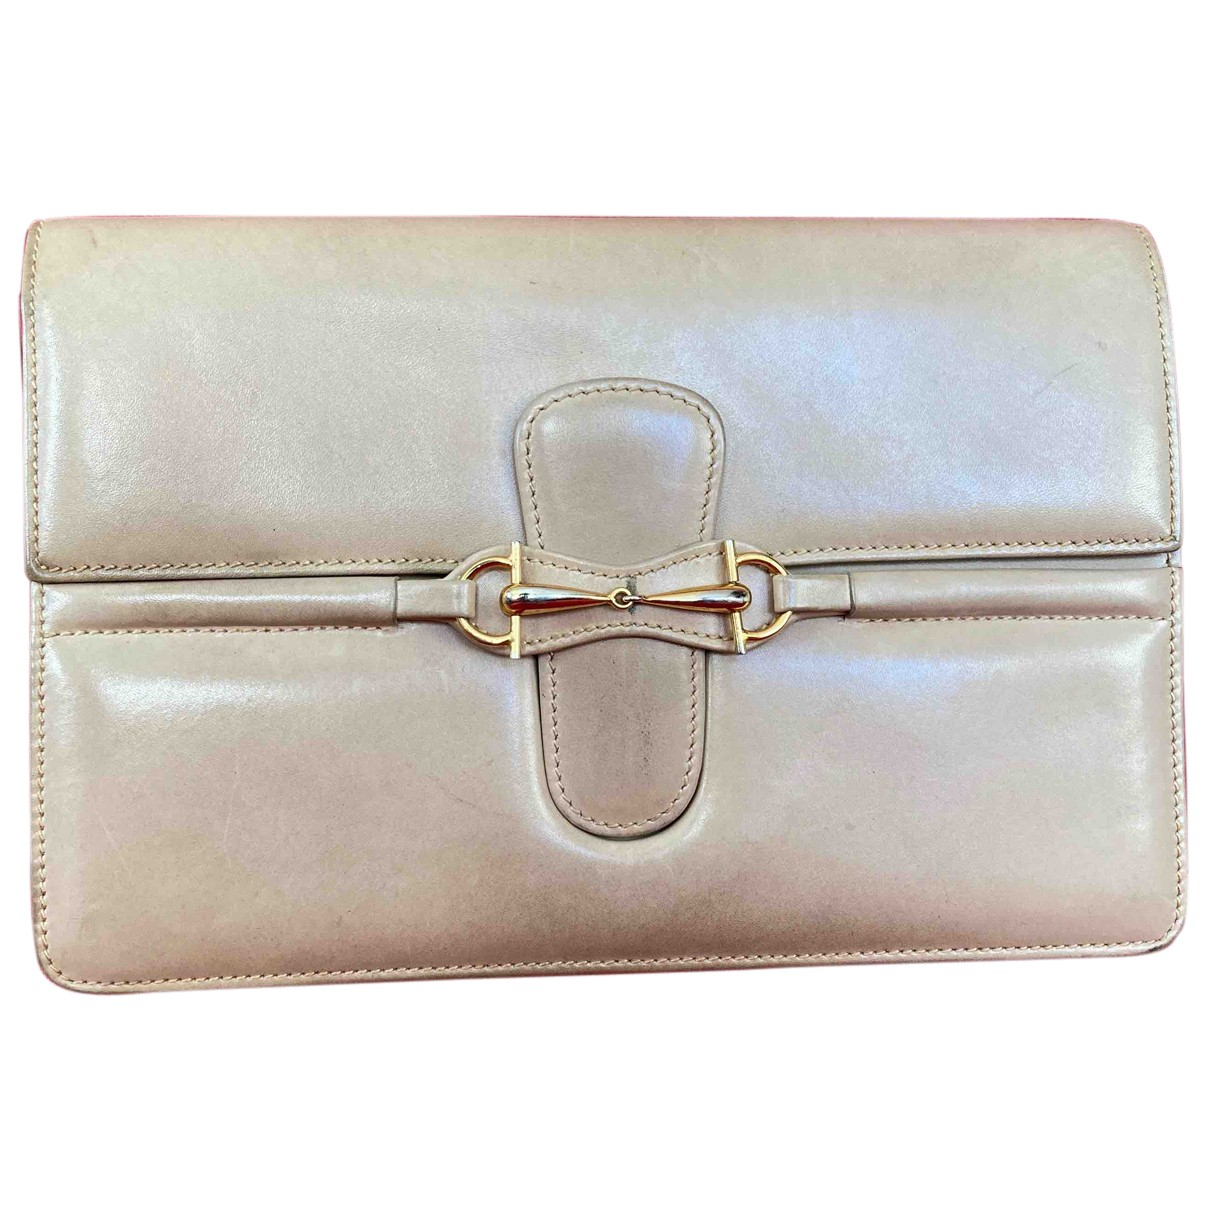 Gucci N Beige Leather Clutch bag for Women N